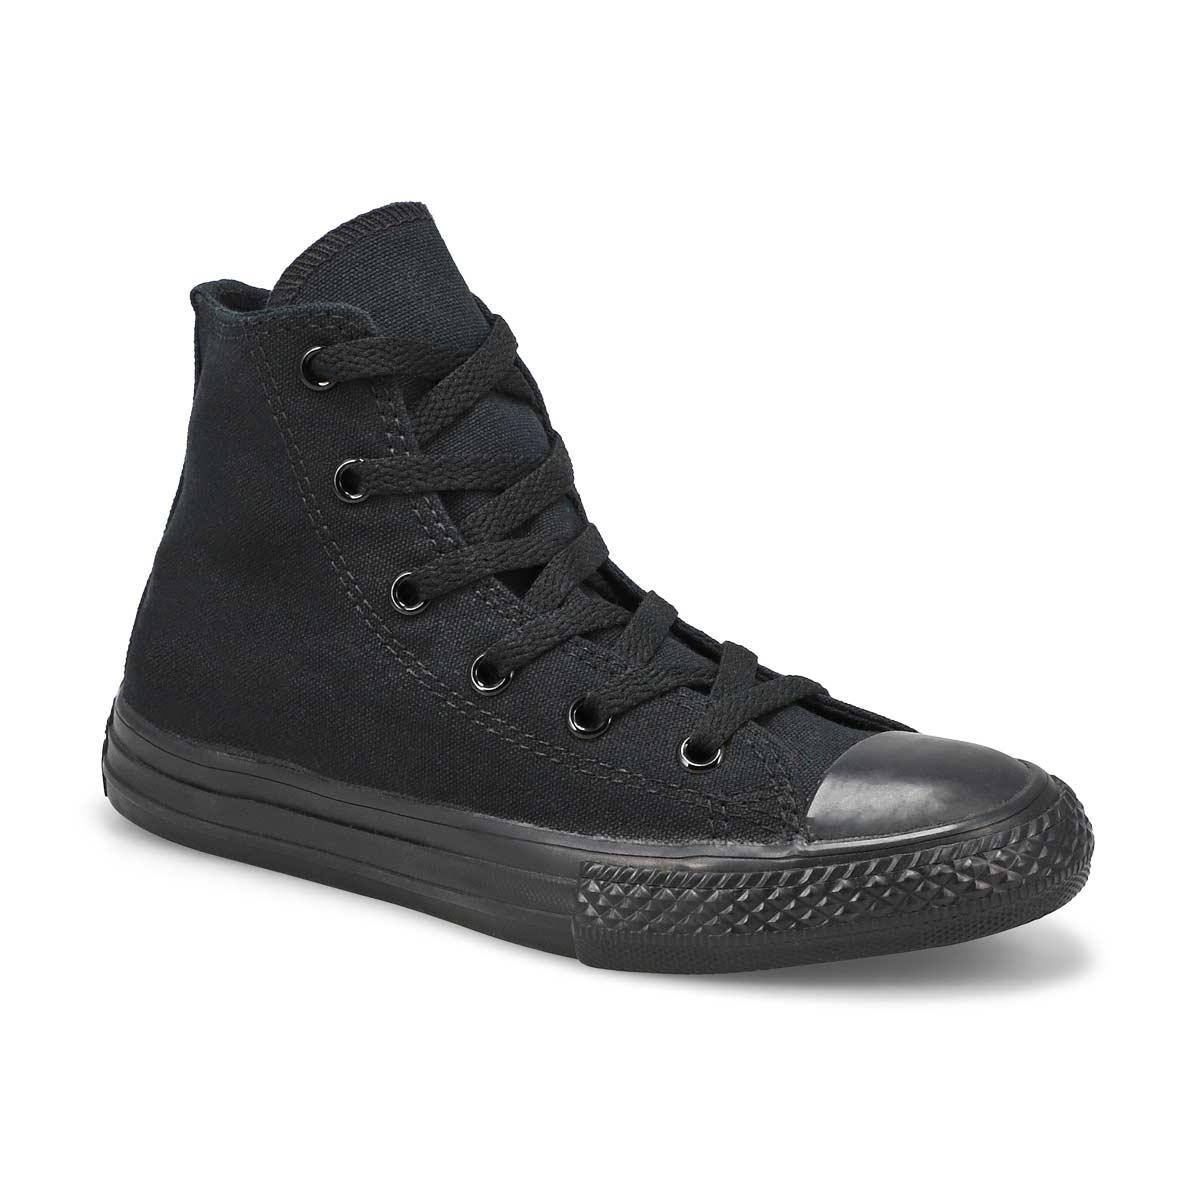 Kds CTAS black mono hi top sneaker